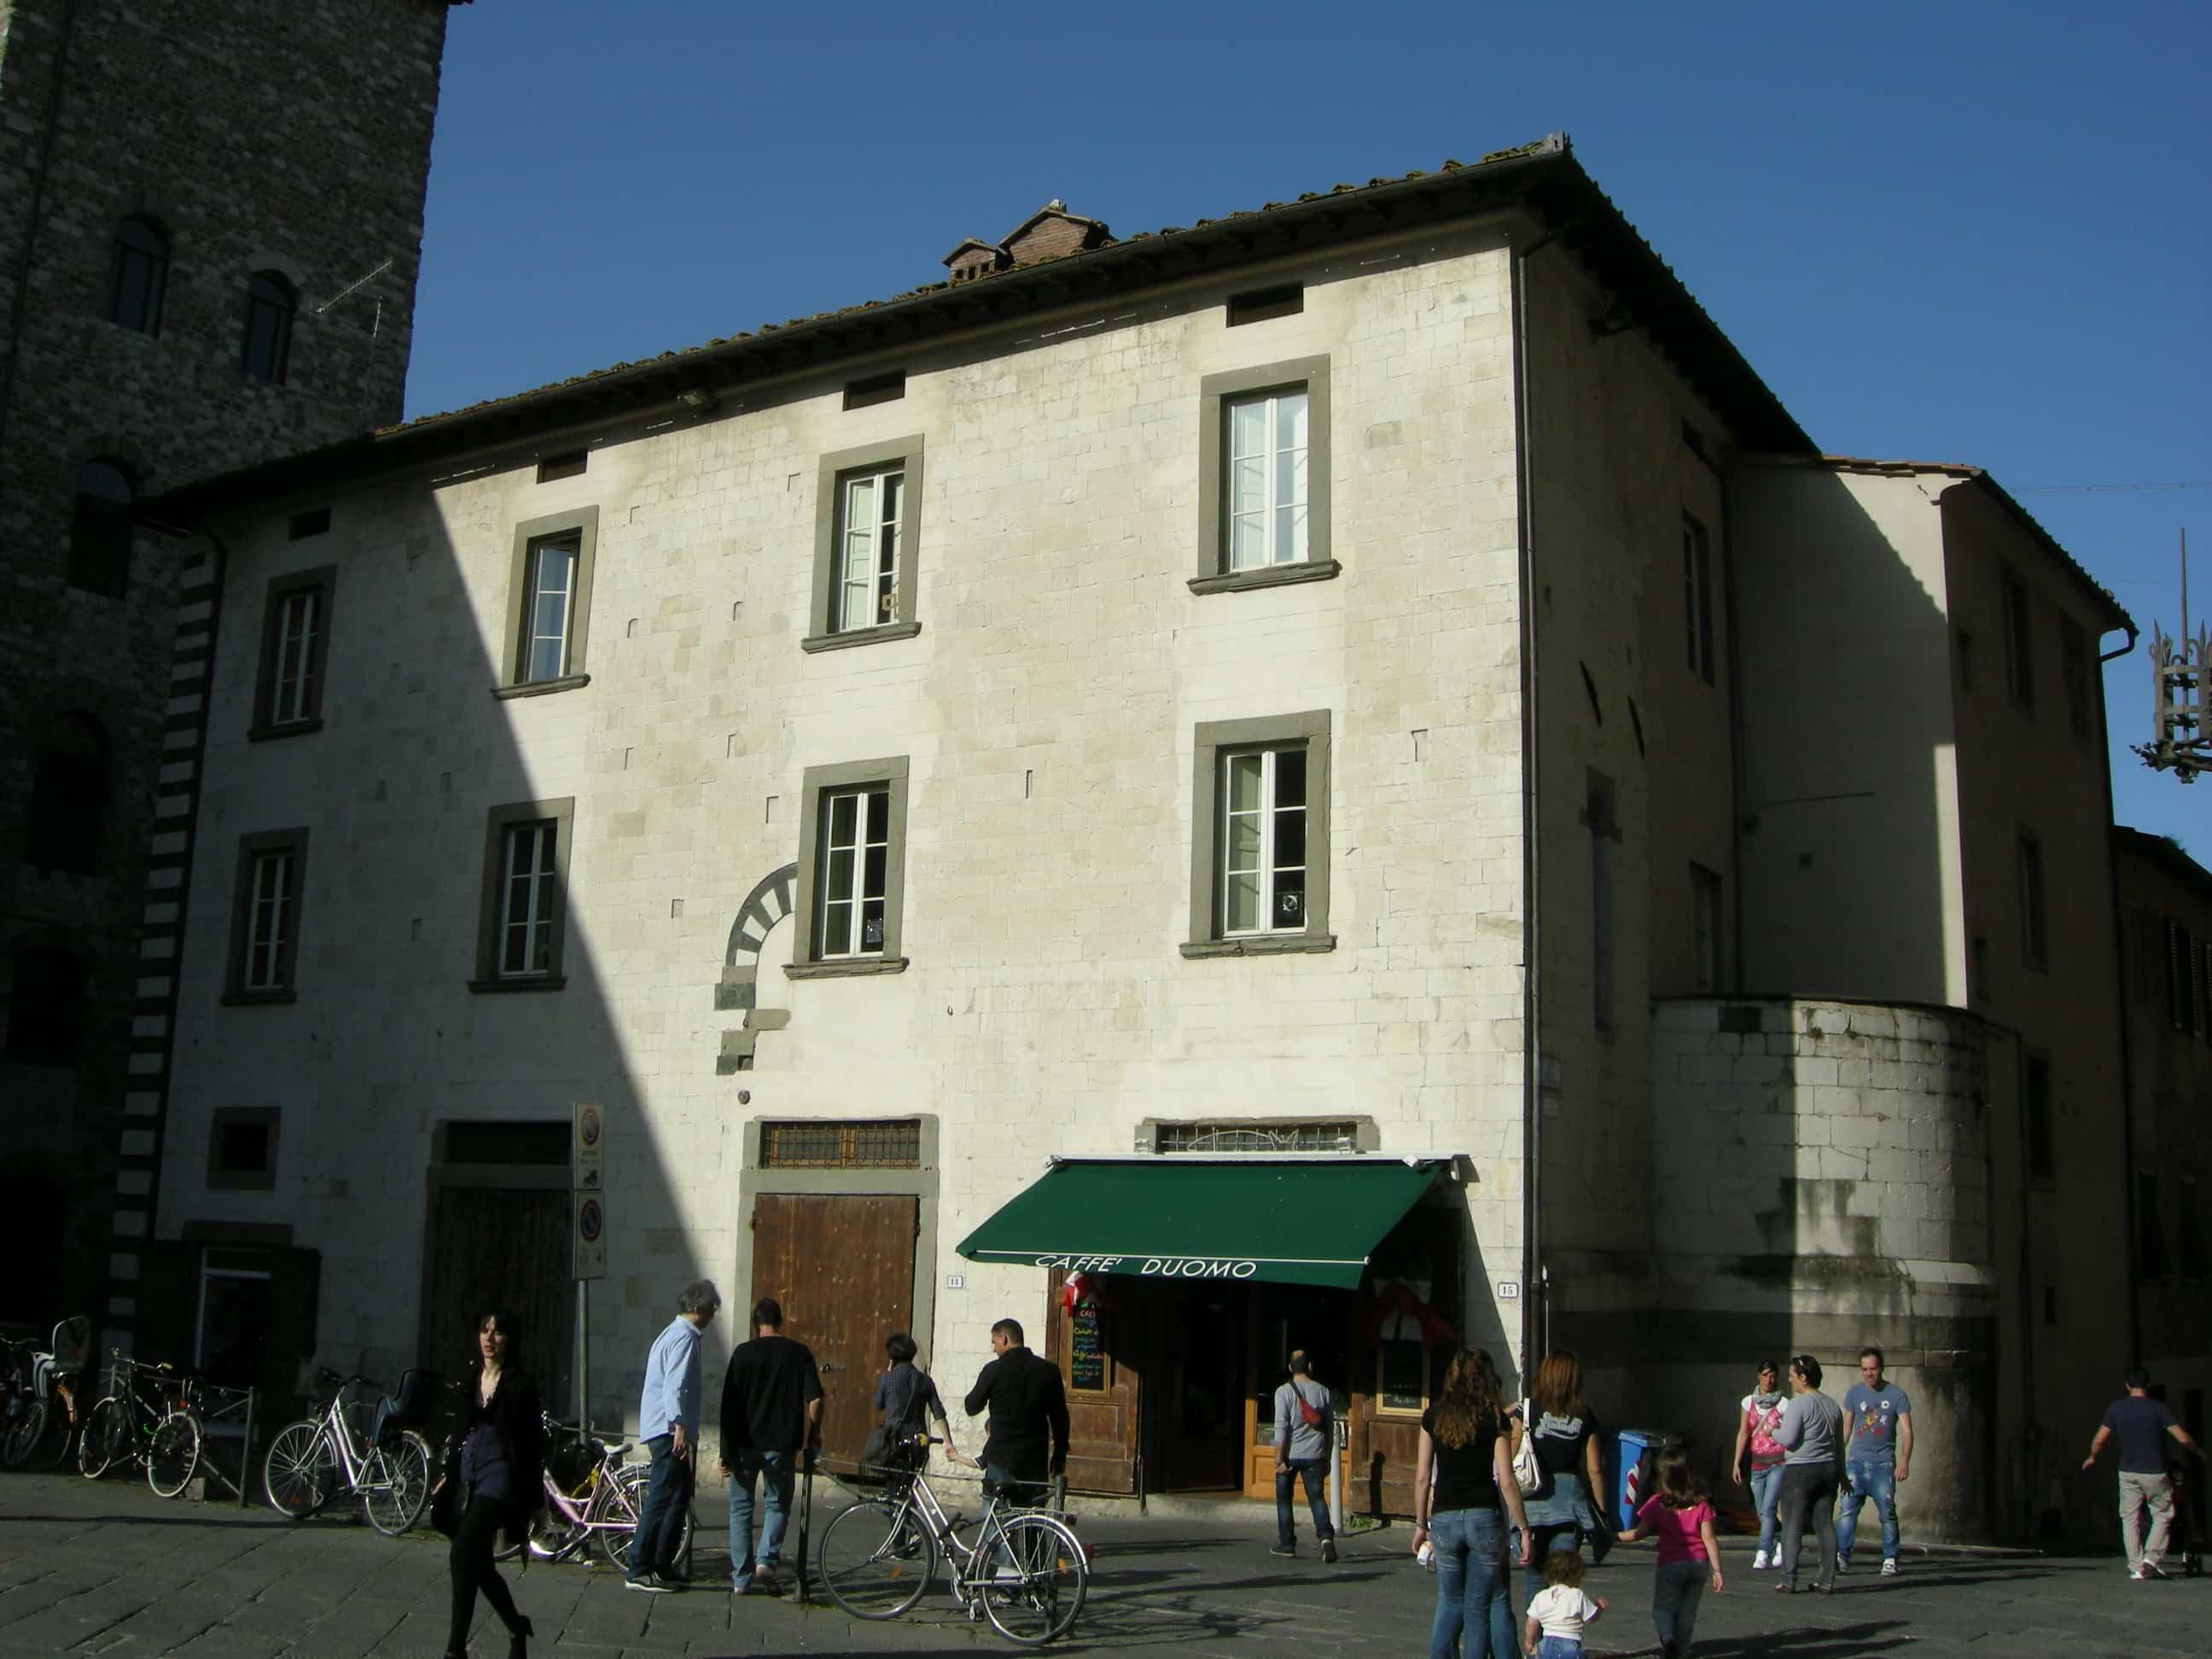 Santa Maria Cavaliera e i Cavalieri pistoiesi